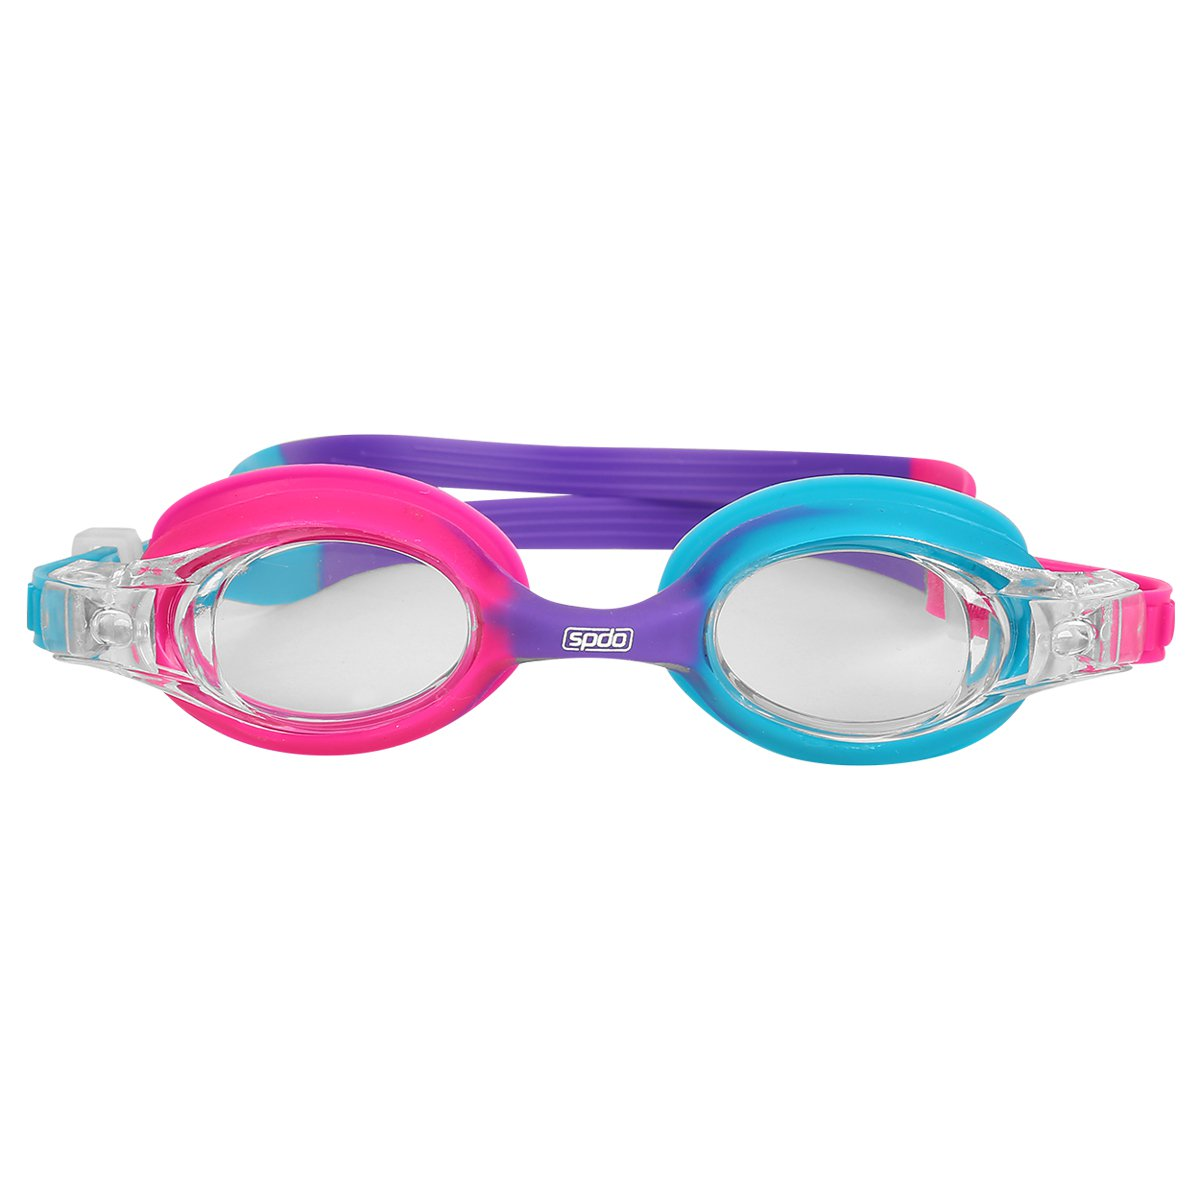 Óculos Speedo Quick Junior - Azul Piscina e Pink - Compre Agora ... bc84ba4d61